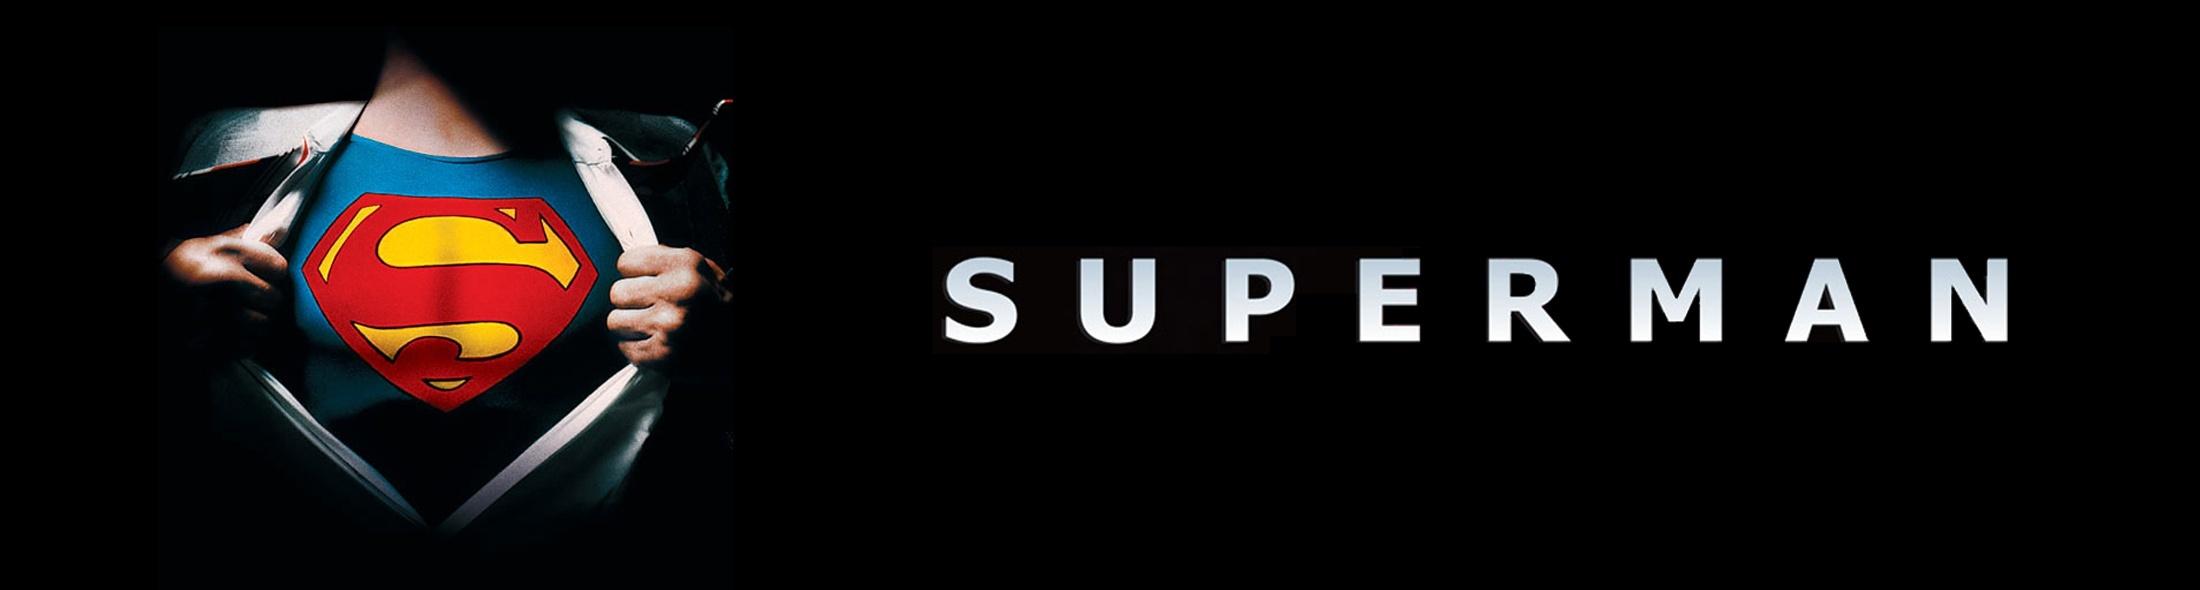 Koning & Eindbaas superman